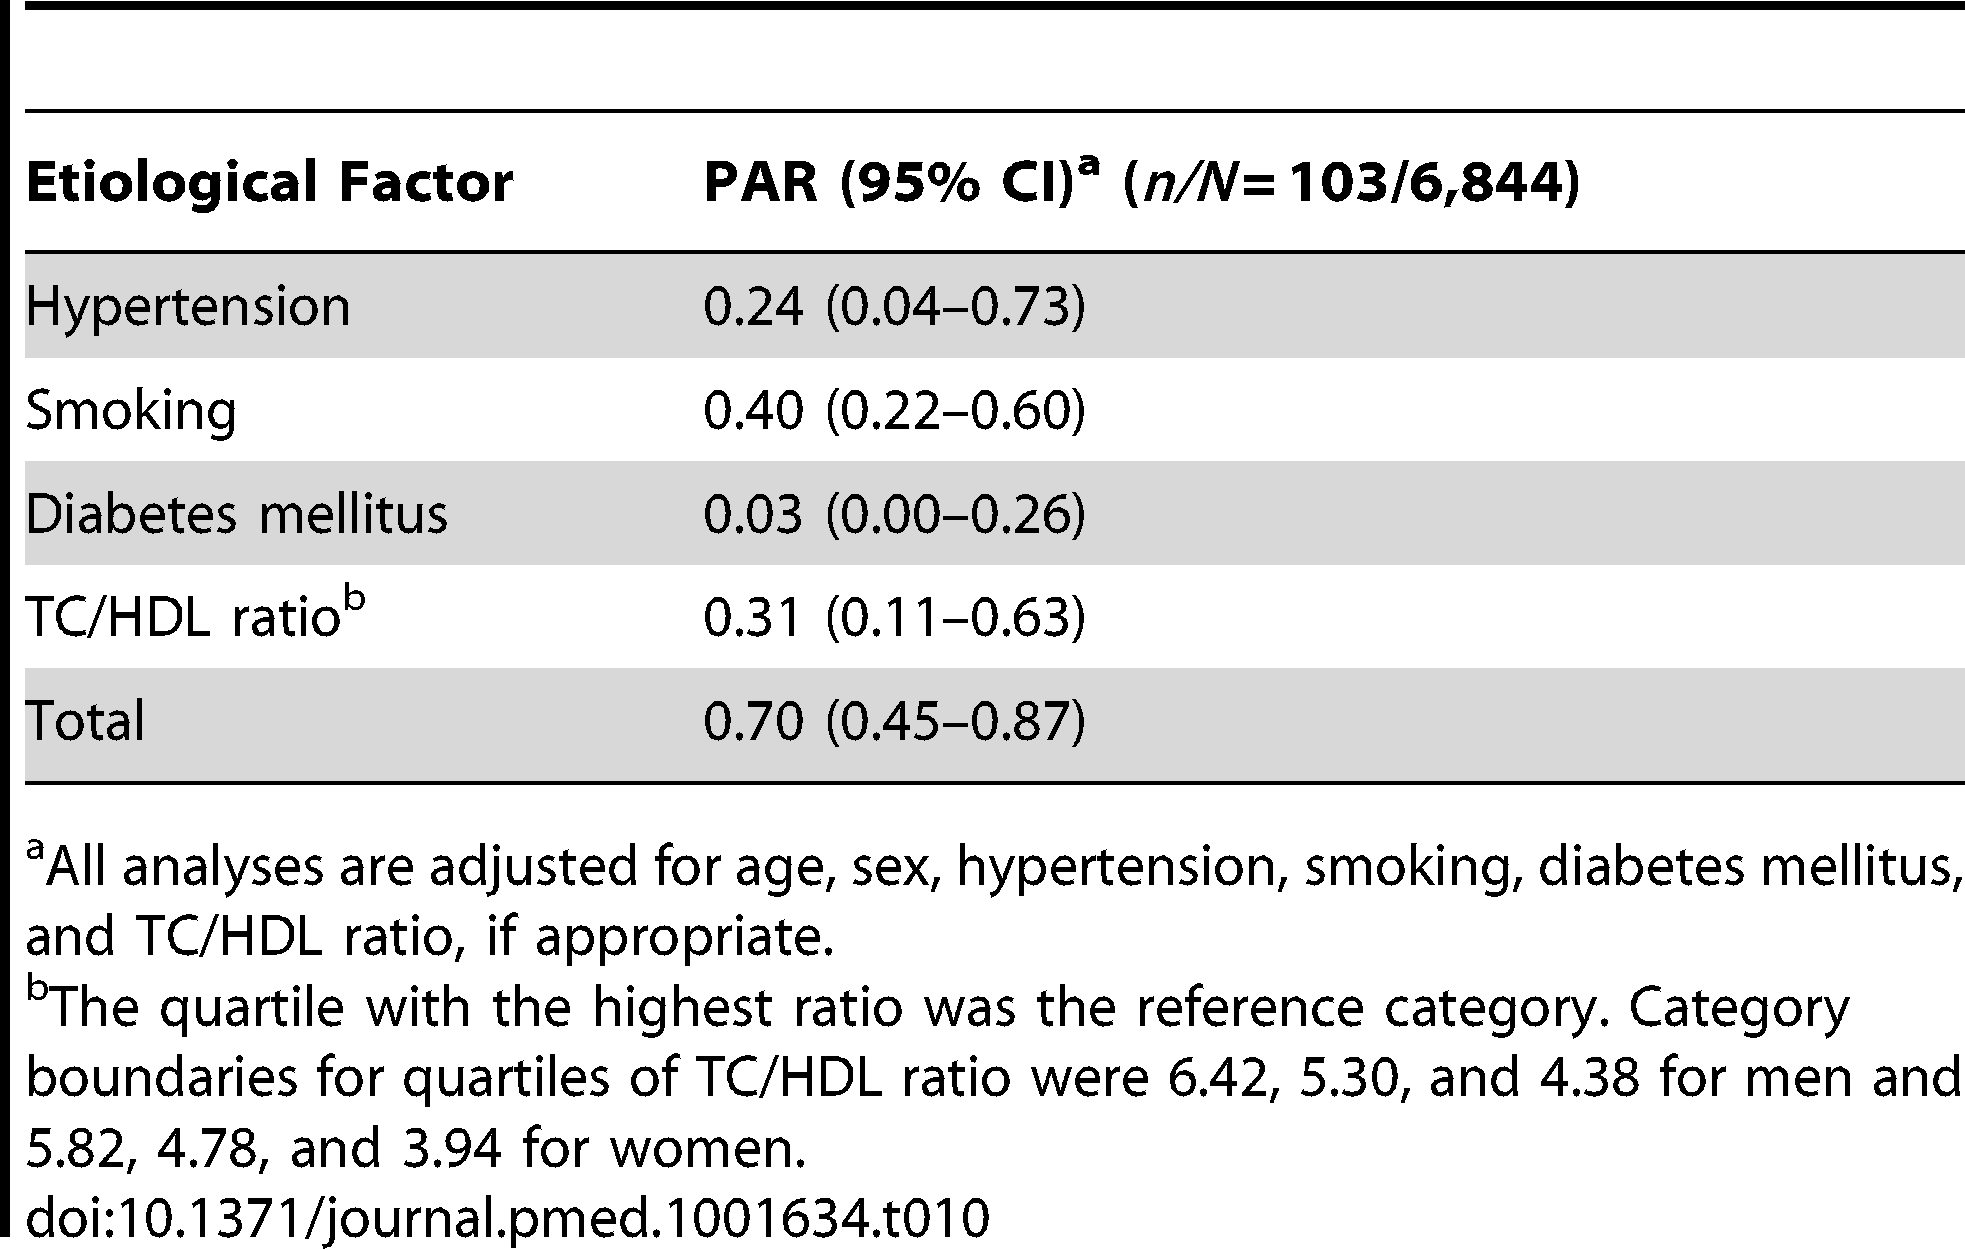 Population attributable risks of presumed etiological factors for hemorrhagic stroke.